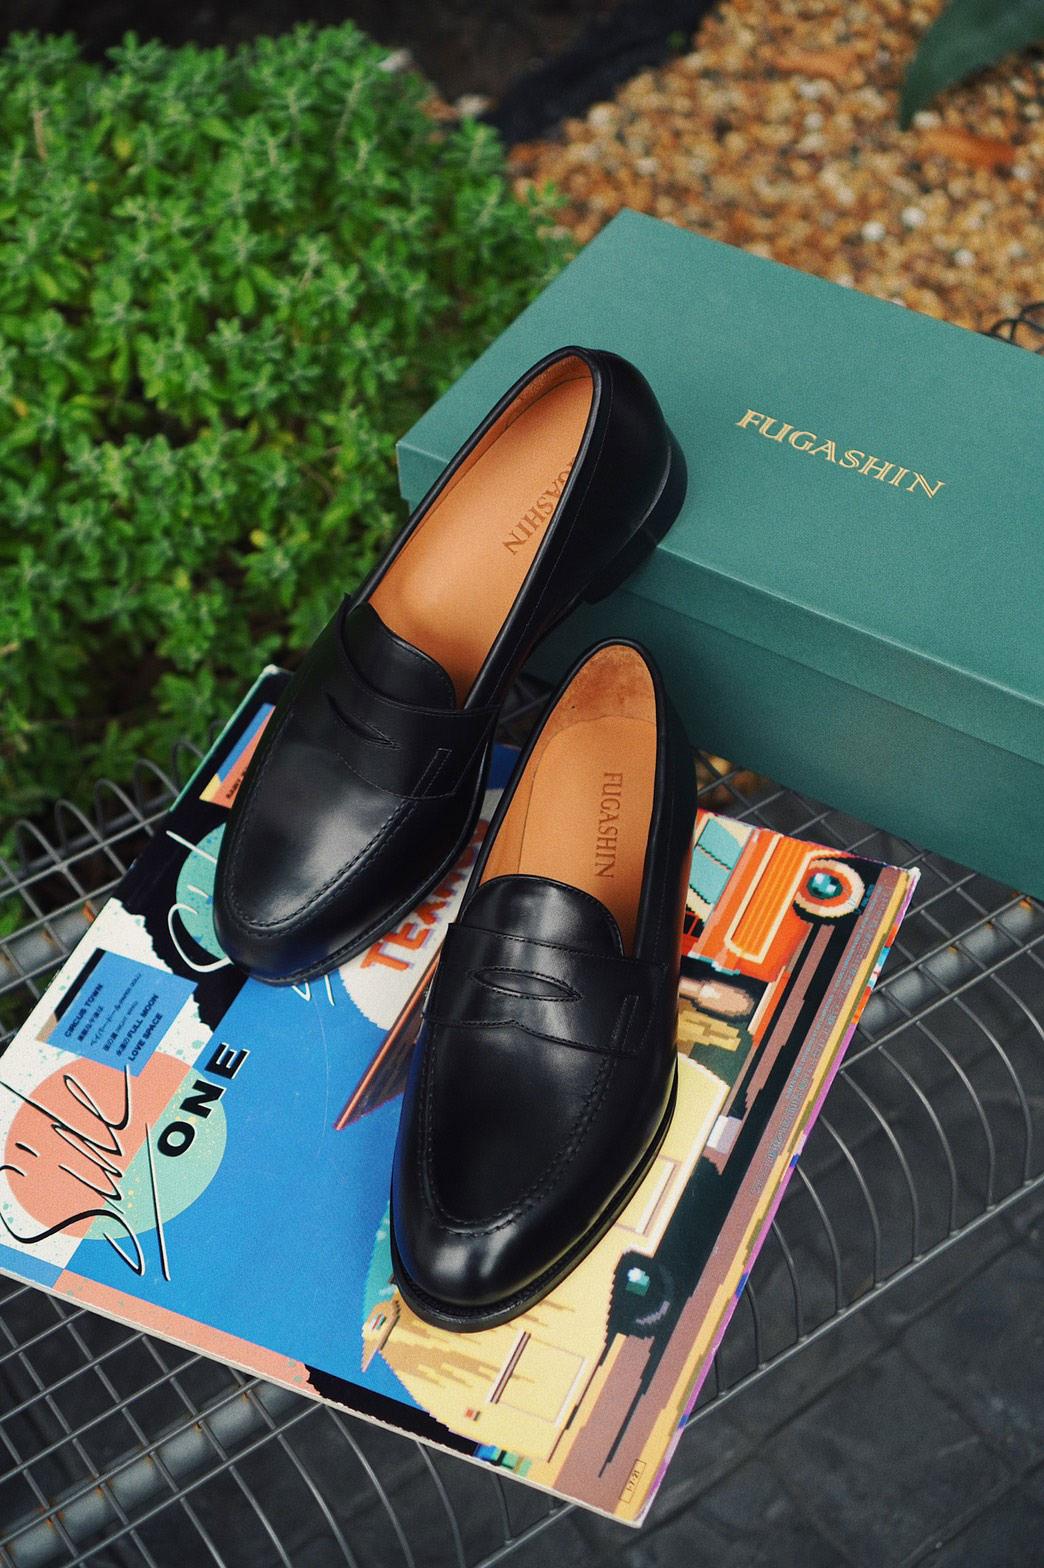 Fugashin New Last Penny Loafers - Black